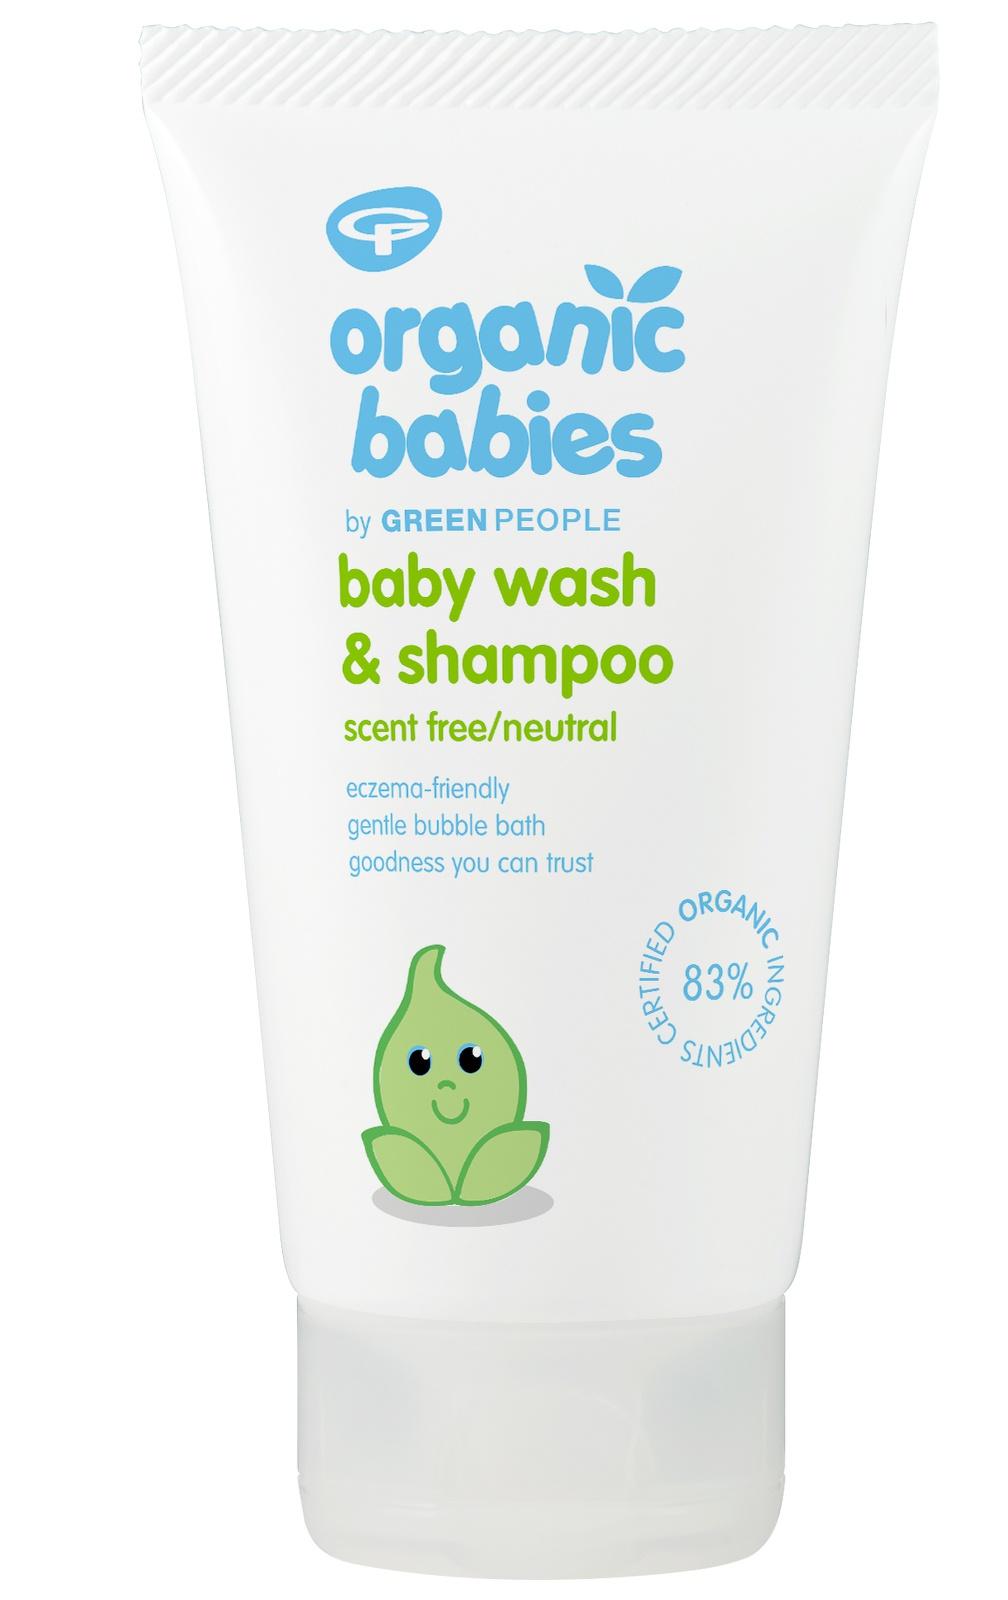 Green People Organic Babies Baby Wash & Shampoo - Scent Free